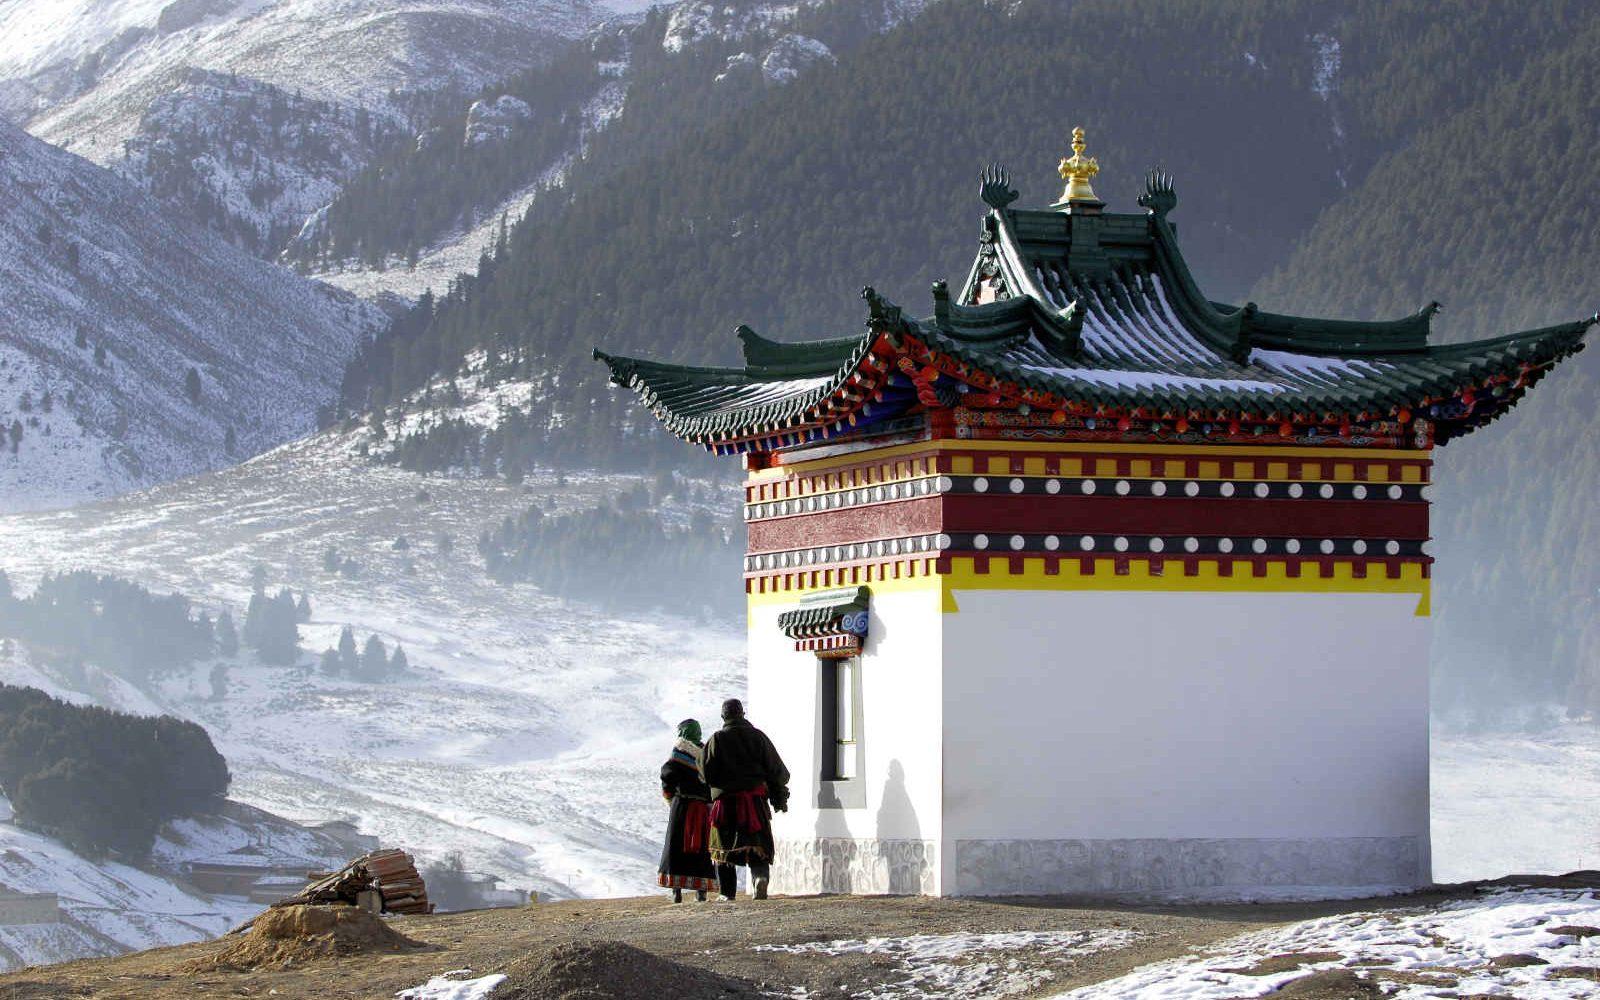 Prayer and Temple, Nepal